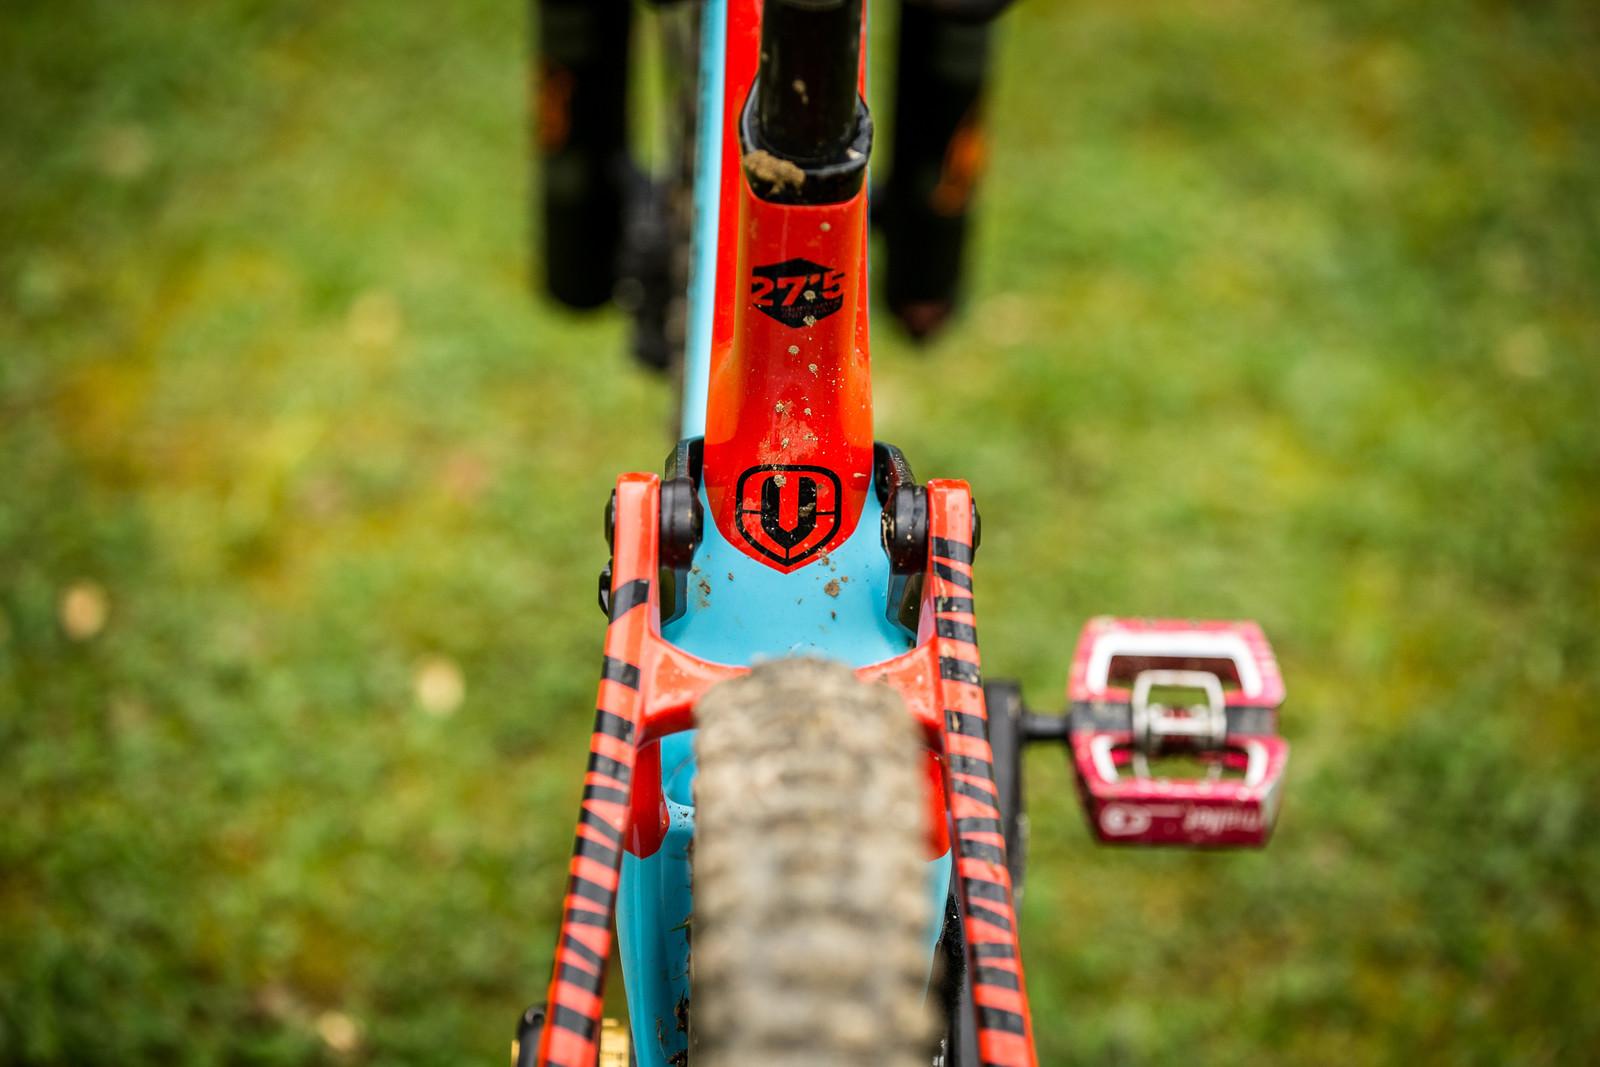 27.5-inch wheels - WINNING BIKE - Laurie Greenland's Mondraker Summum - Mountain Biking Pictures - Vital MTB